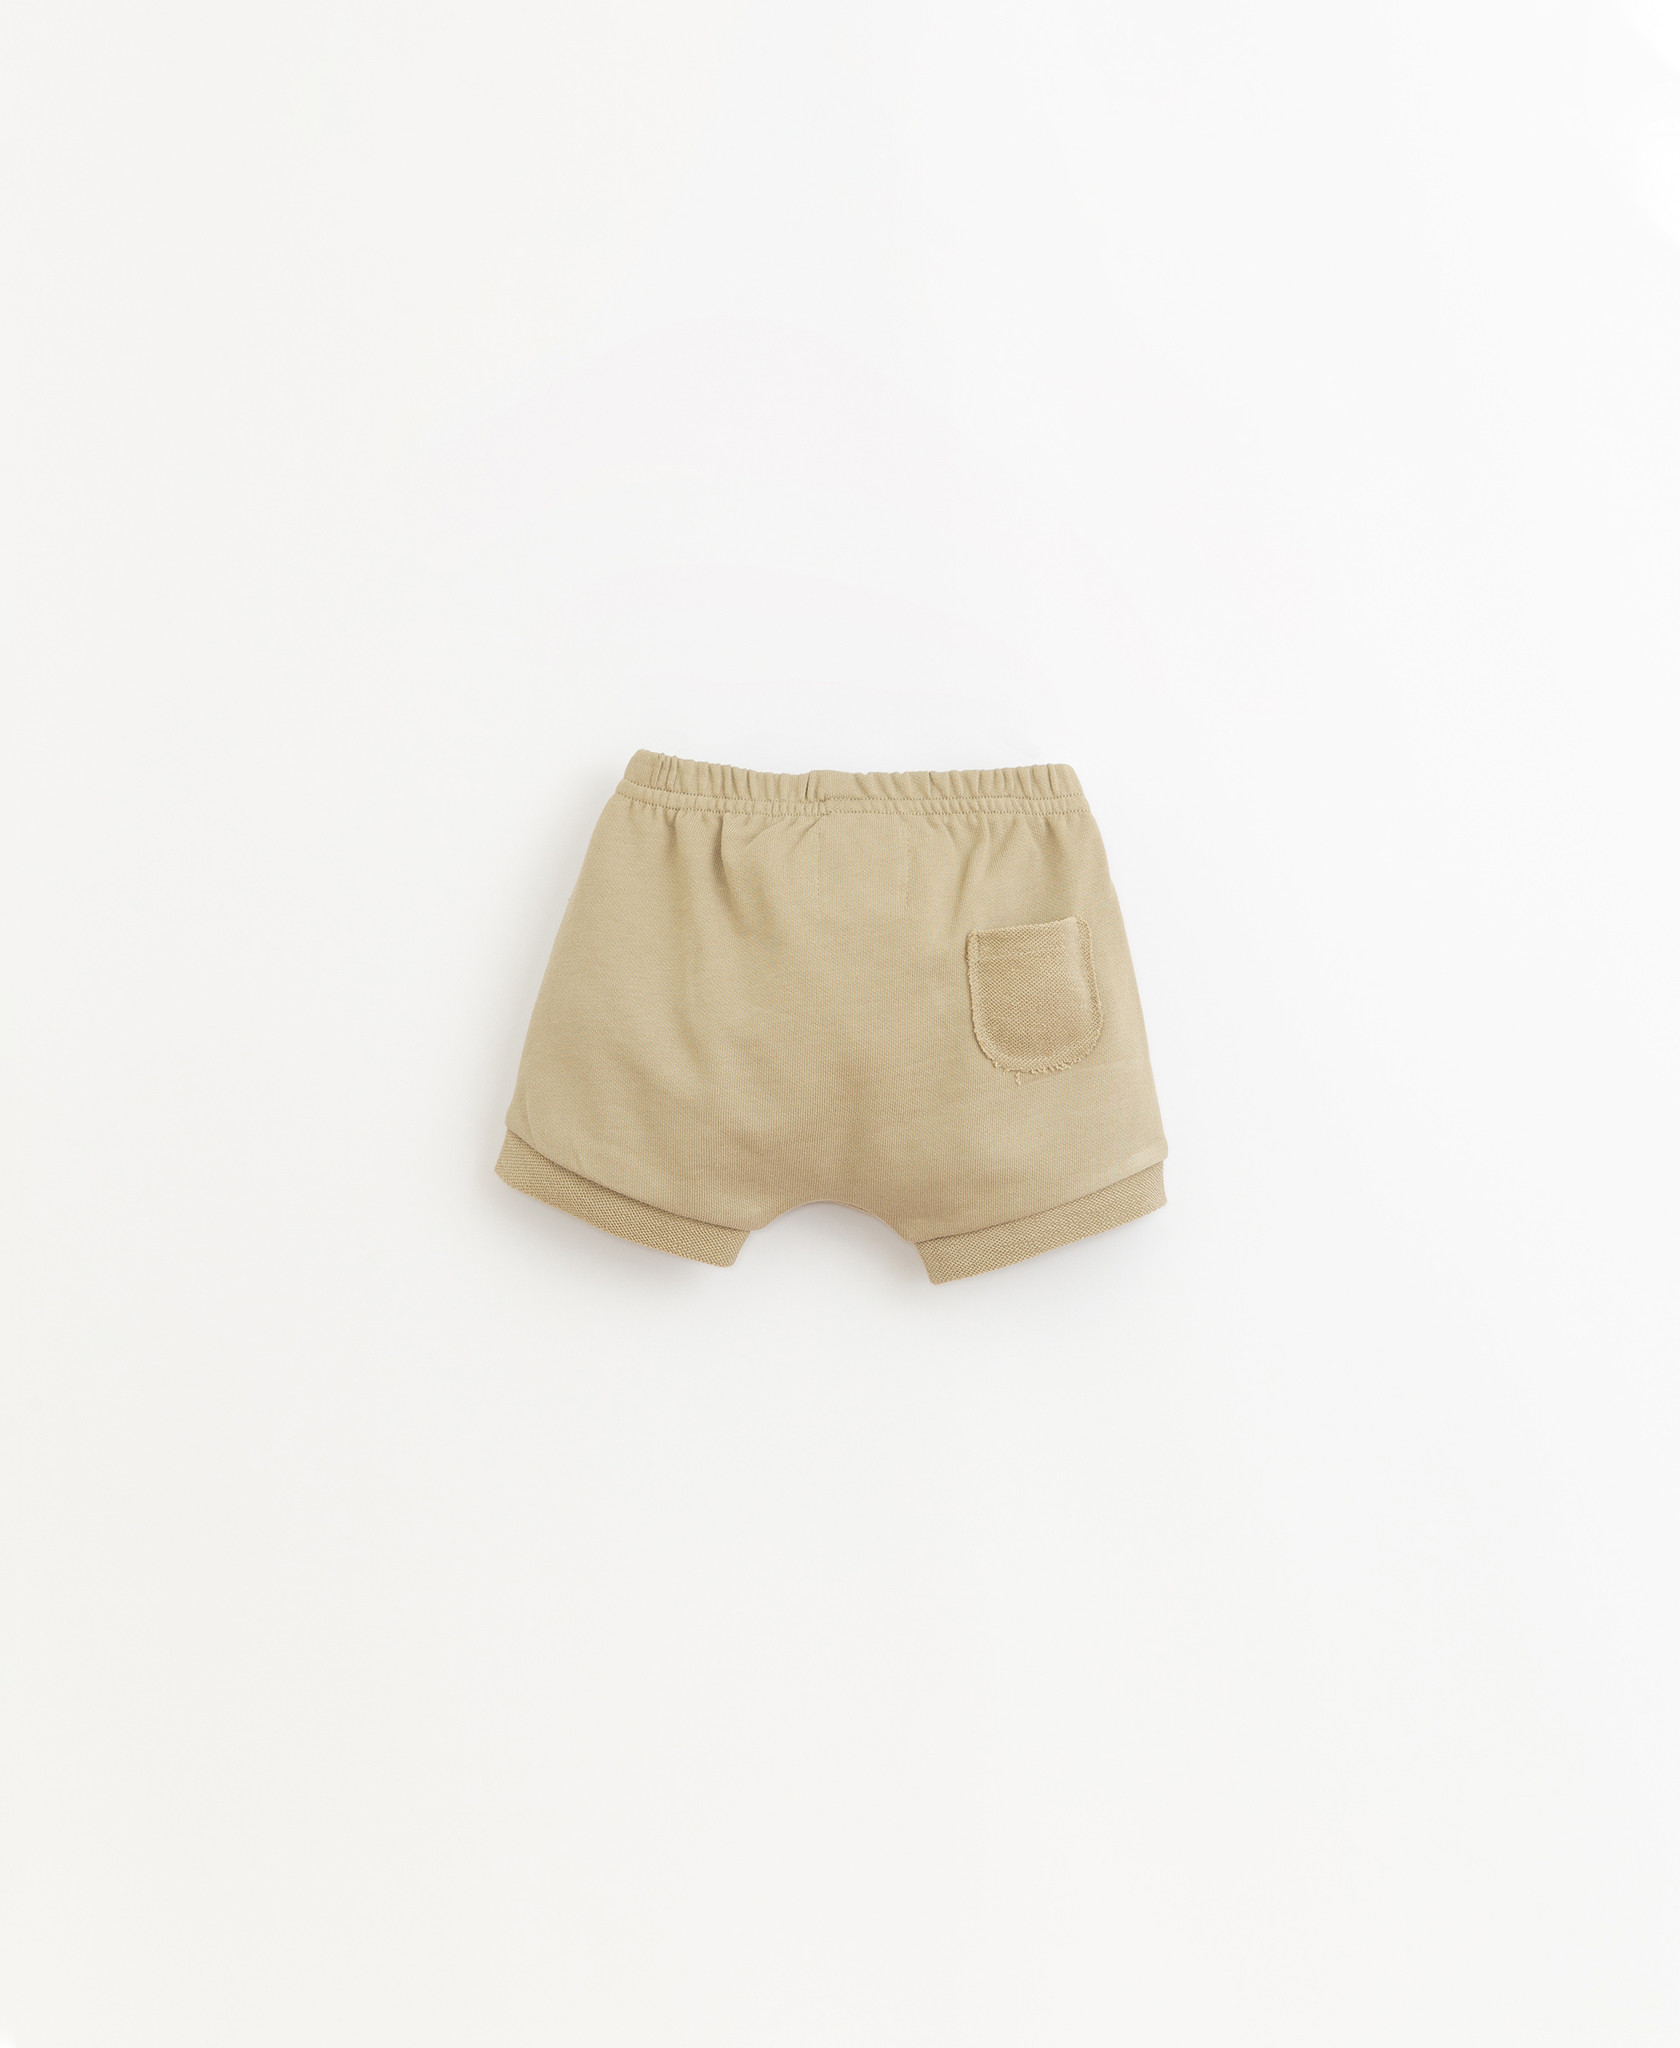 Play-up Fleece short   Joao